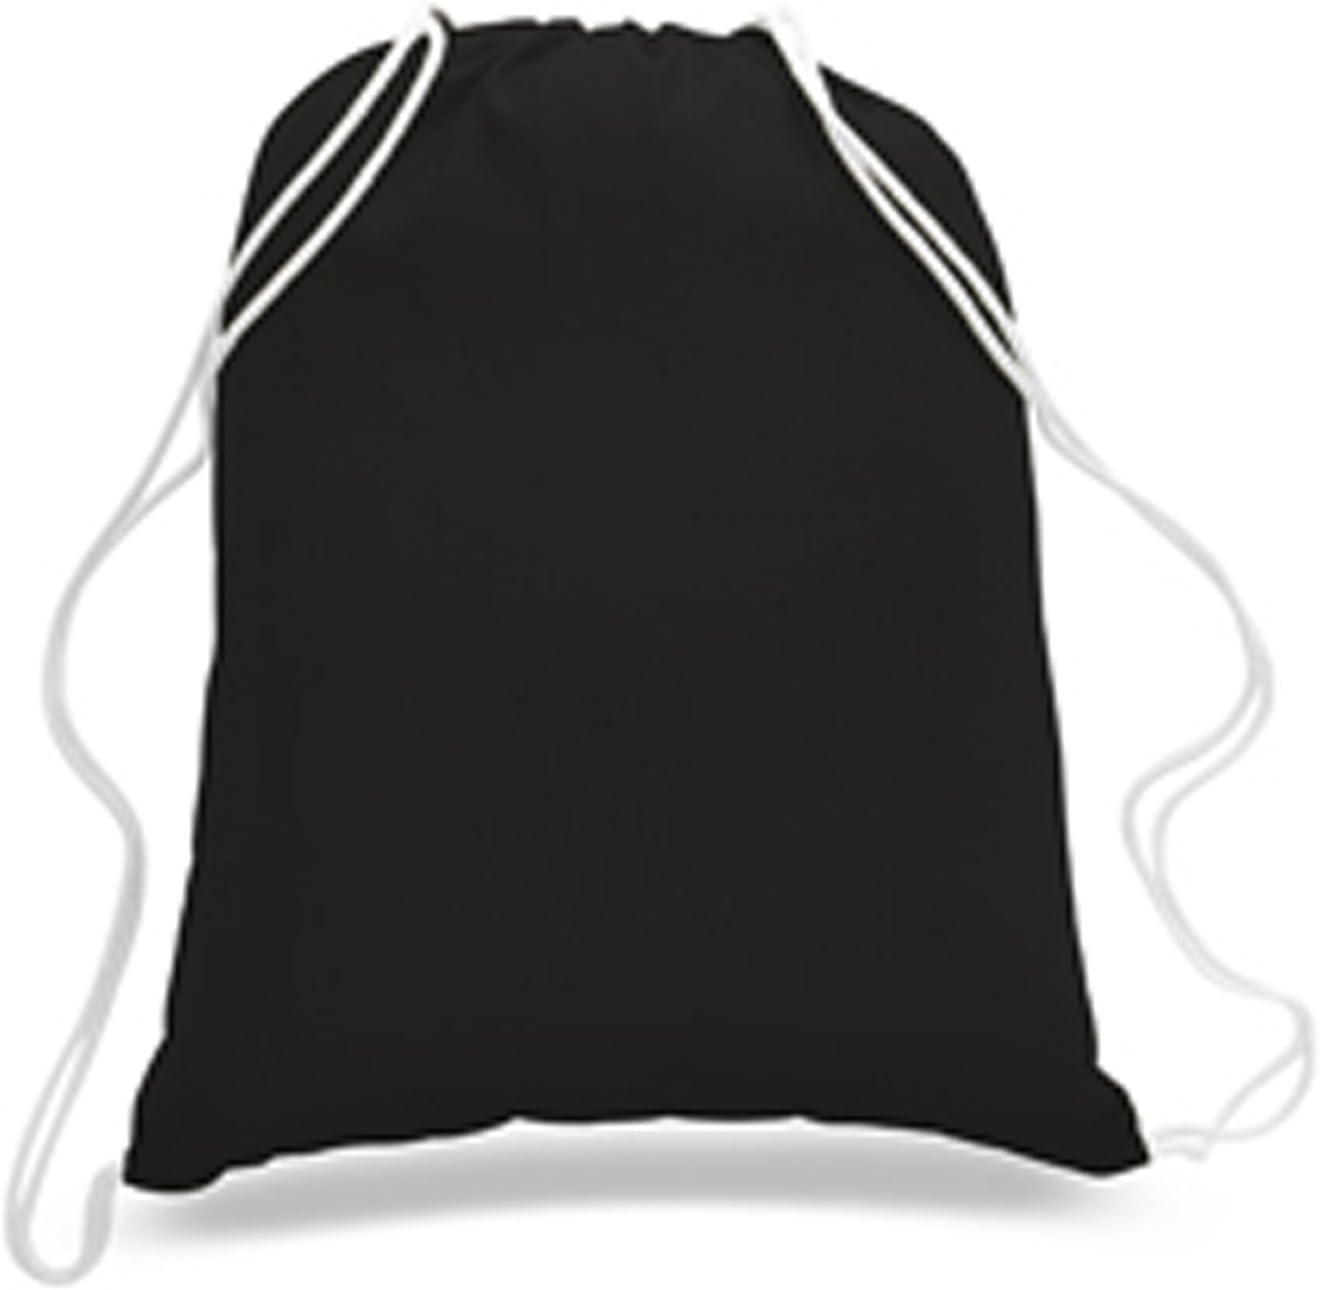 1 Dozen Cotton Natural Drawstring Sack Backpack Bag Tote Sports Wholesale Bulk